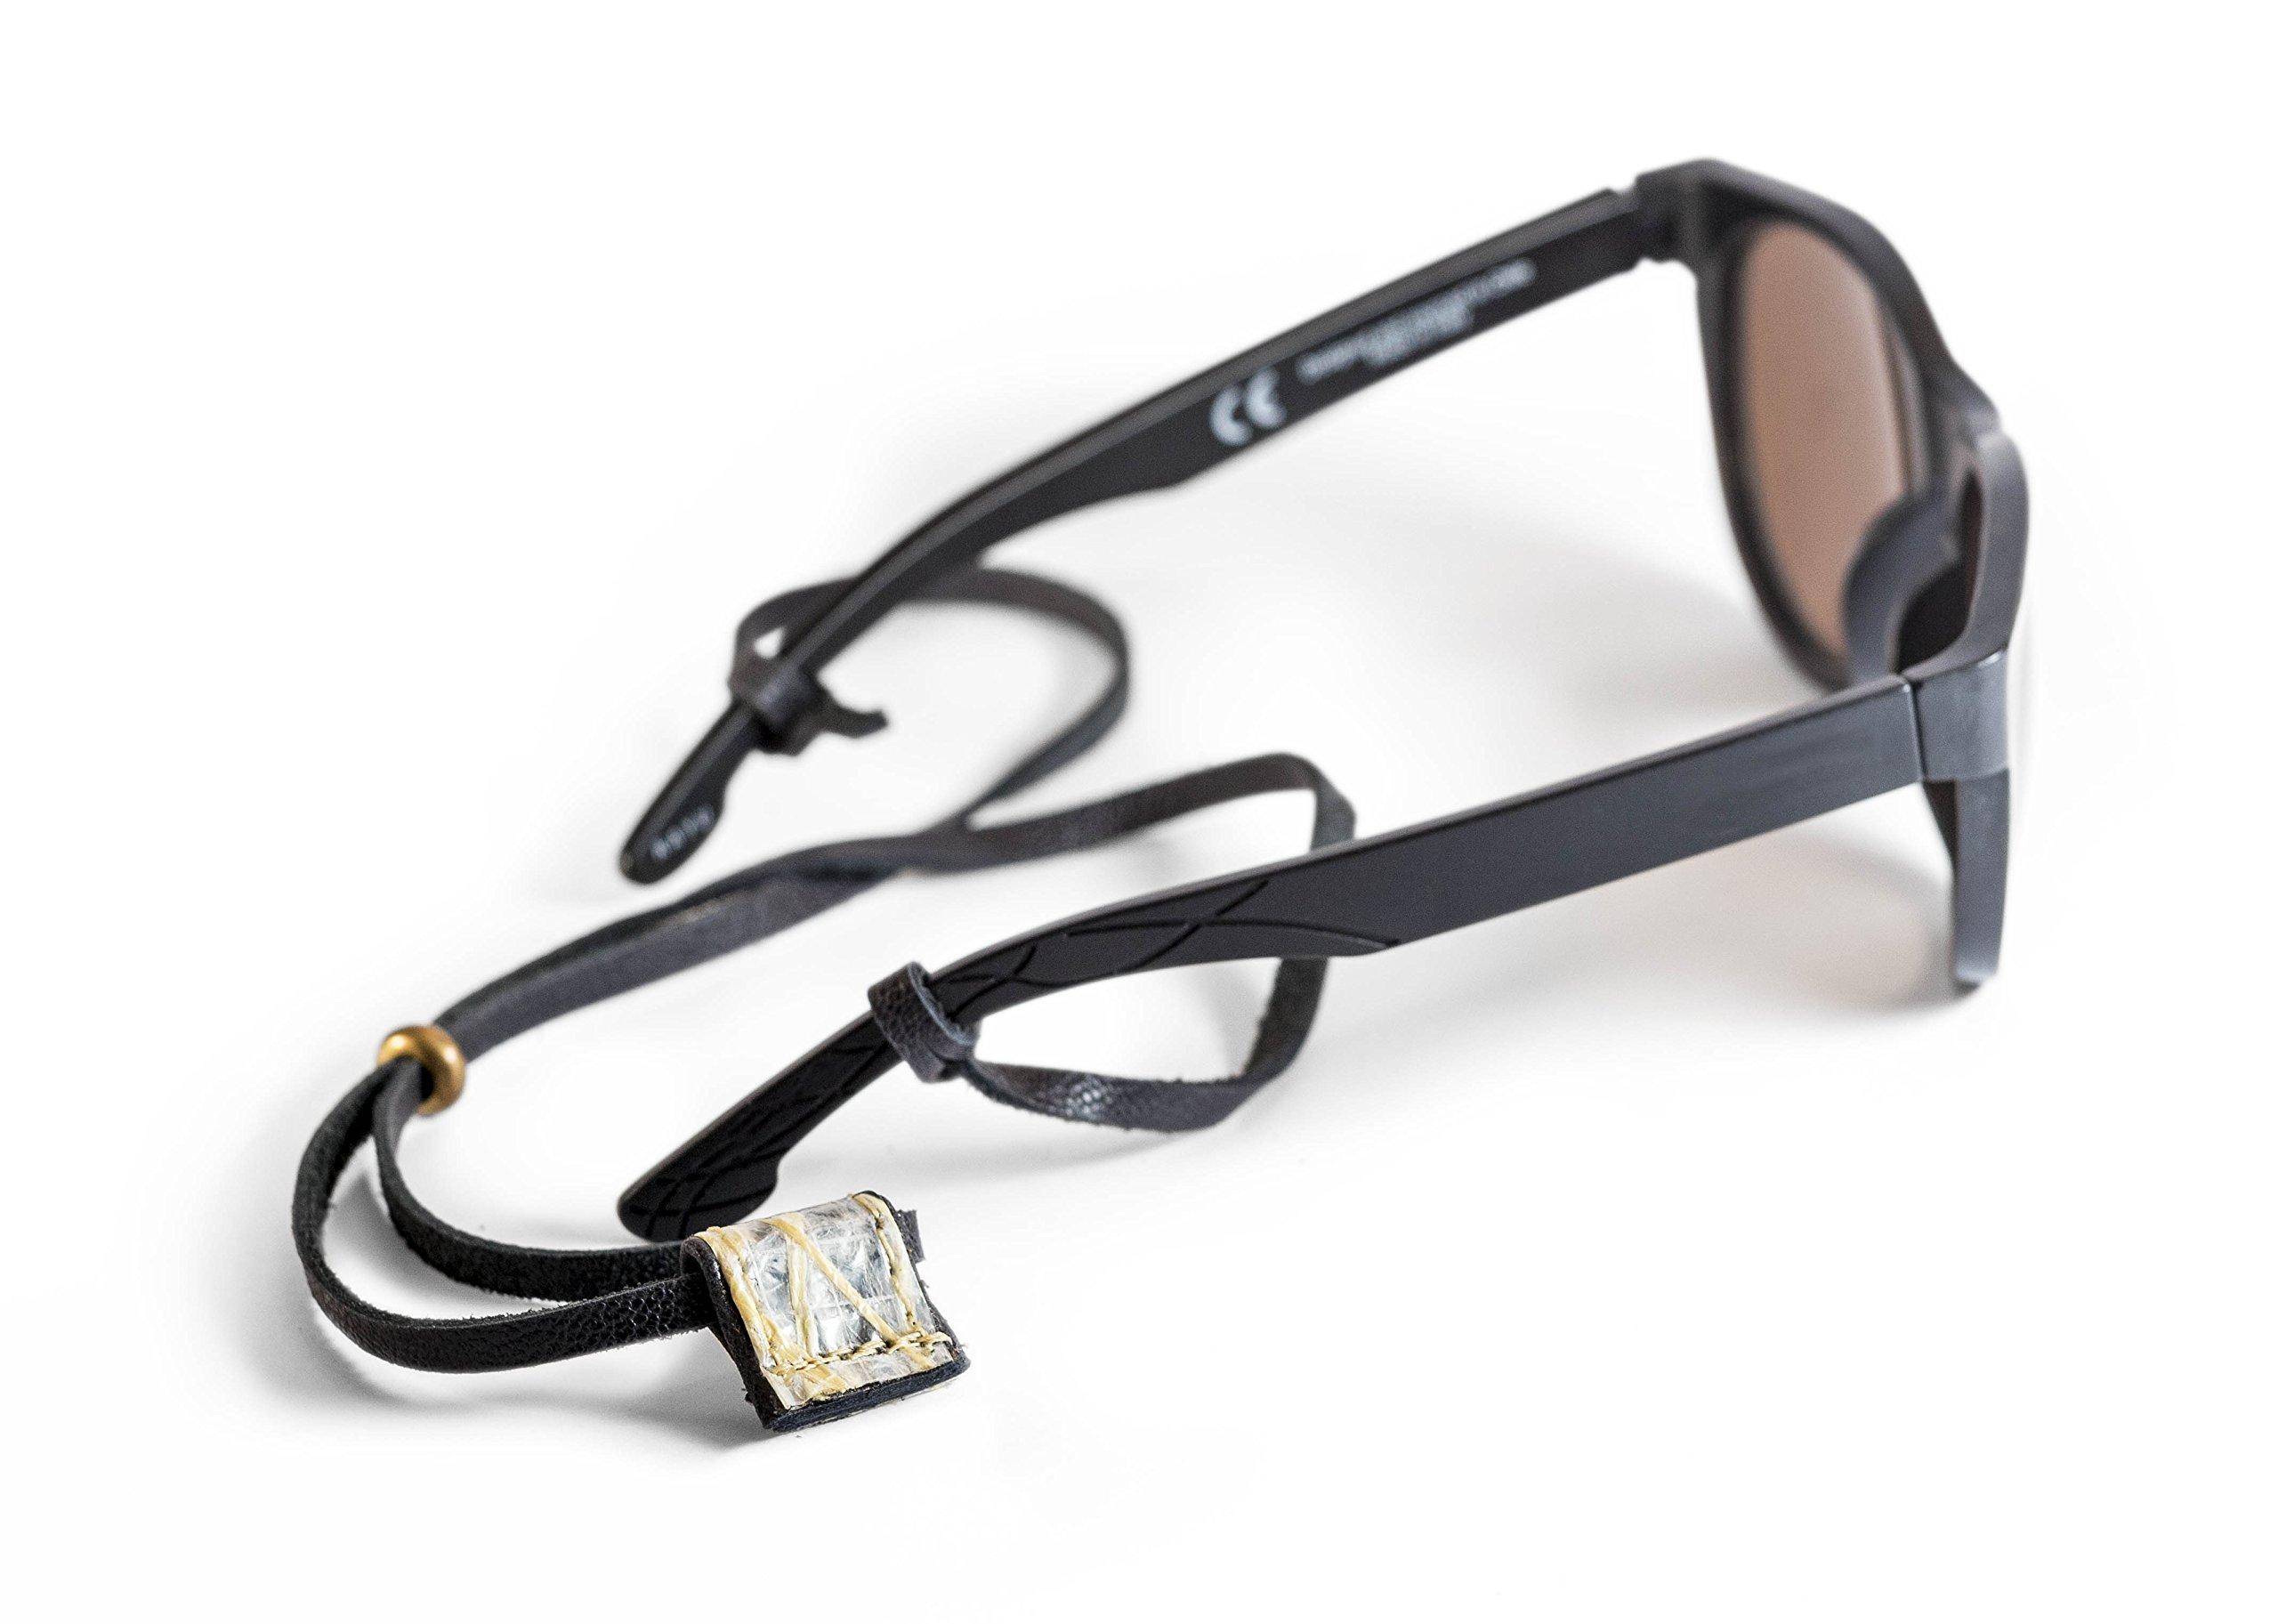 Sunglass Strap, Eyewear holder, Eyeglass Retainer. Handmade, sailing gift leather & sailcloth